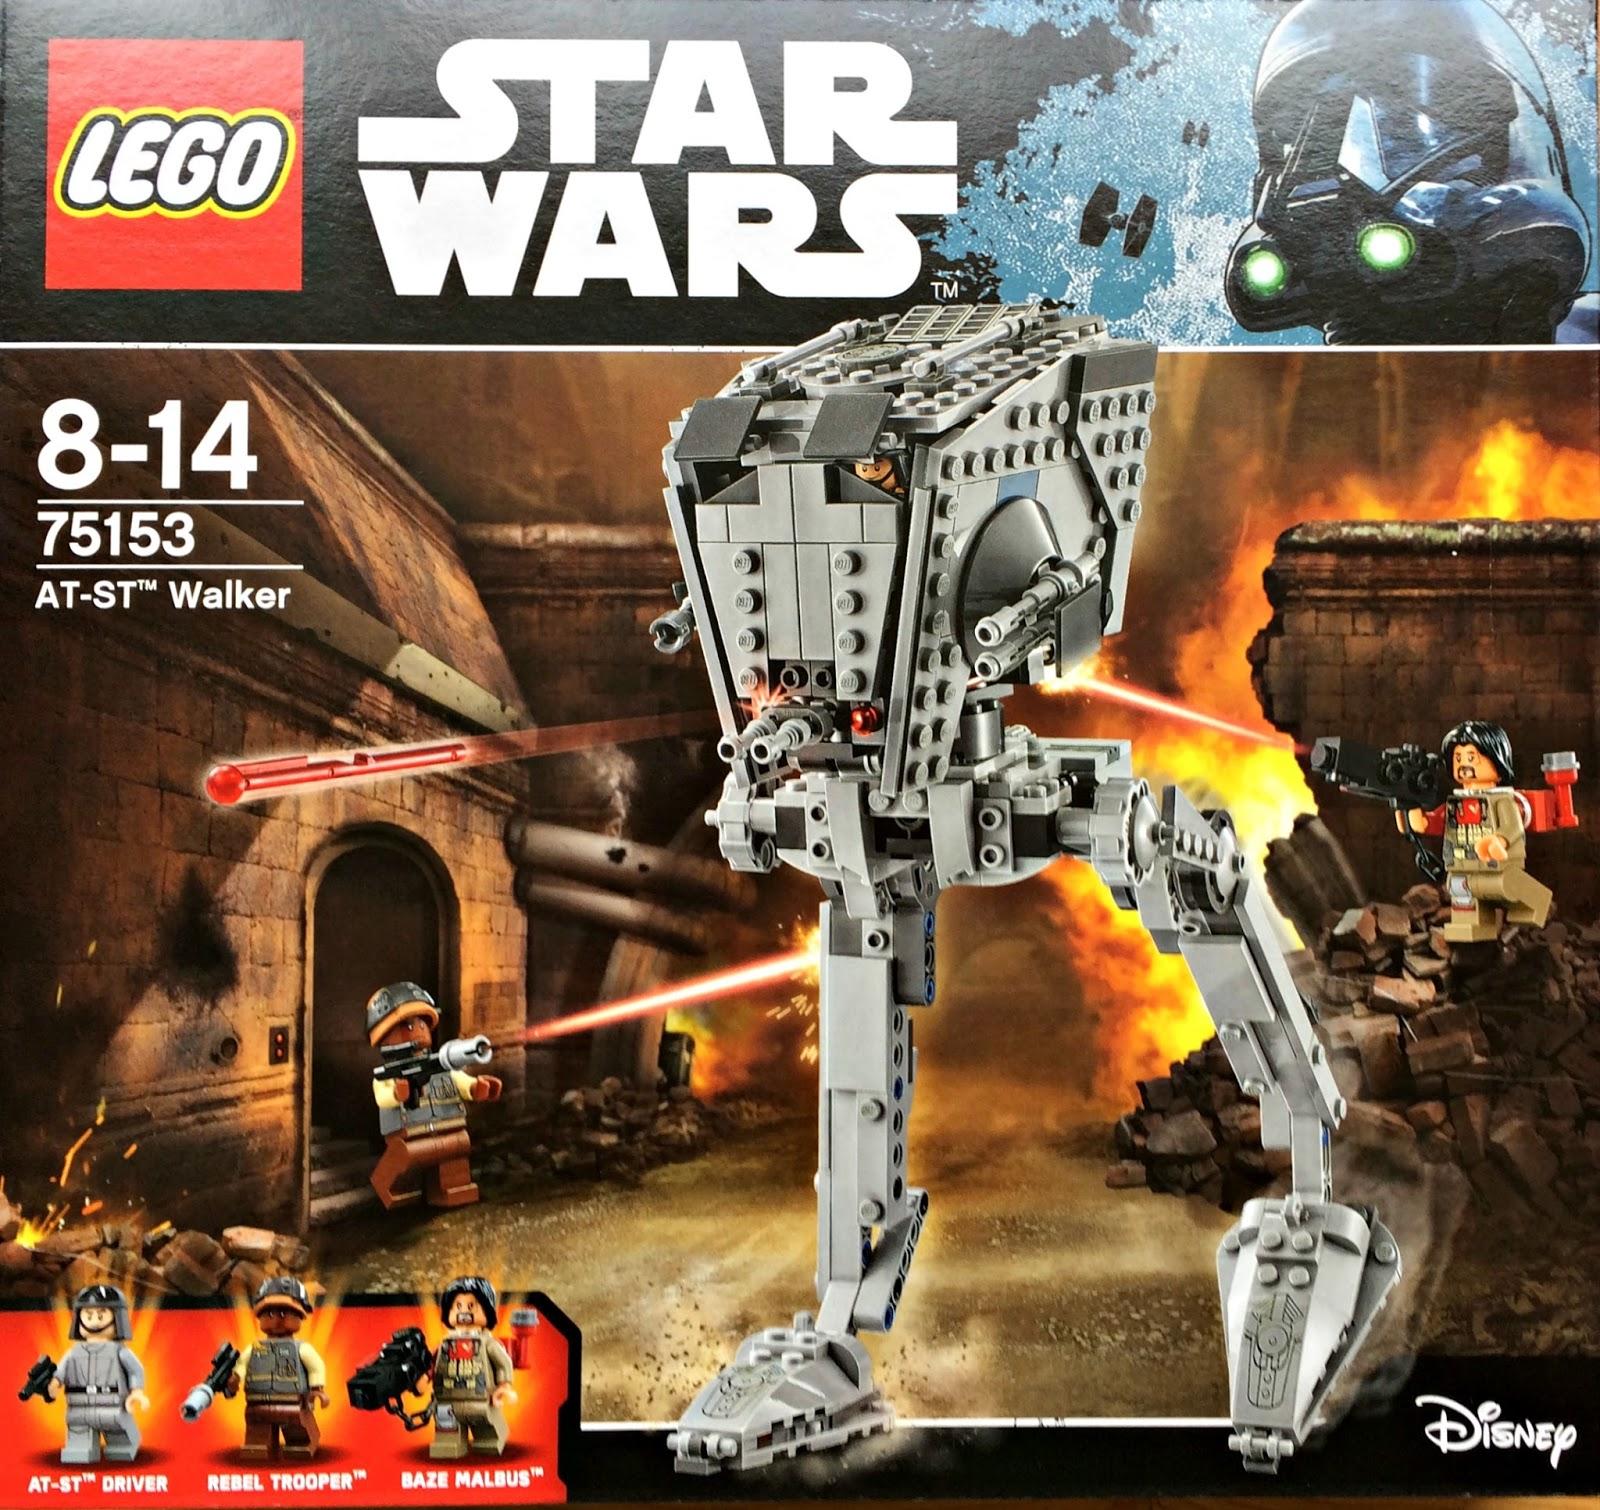 Lego Star Wars R1 AT-ST Walker 75153 box front